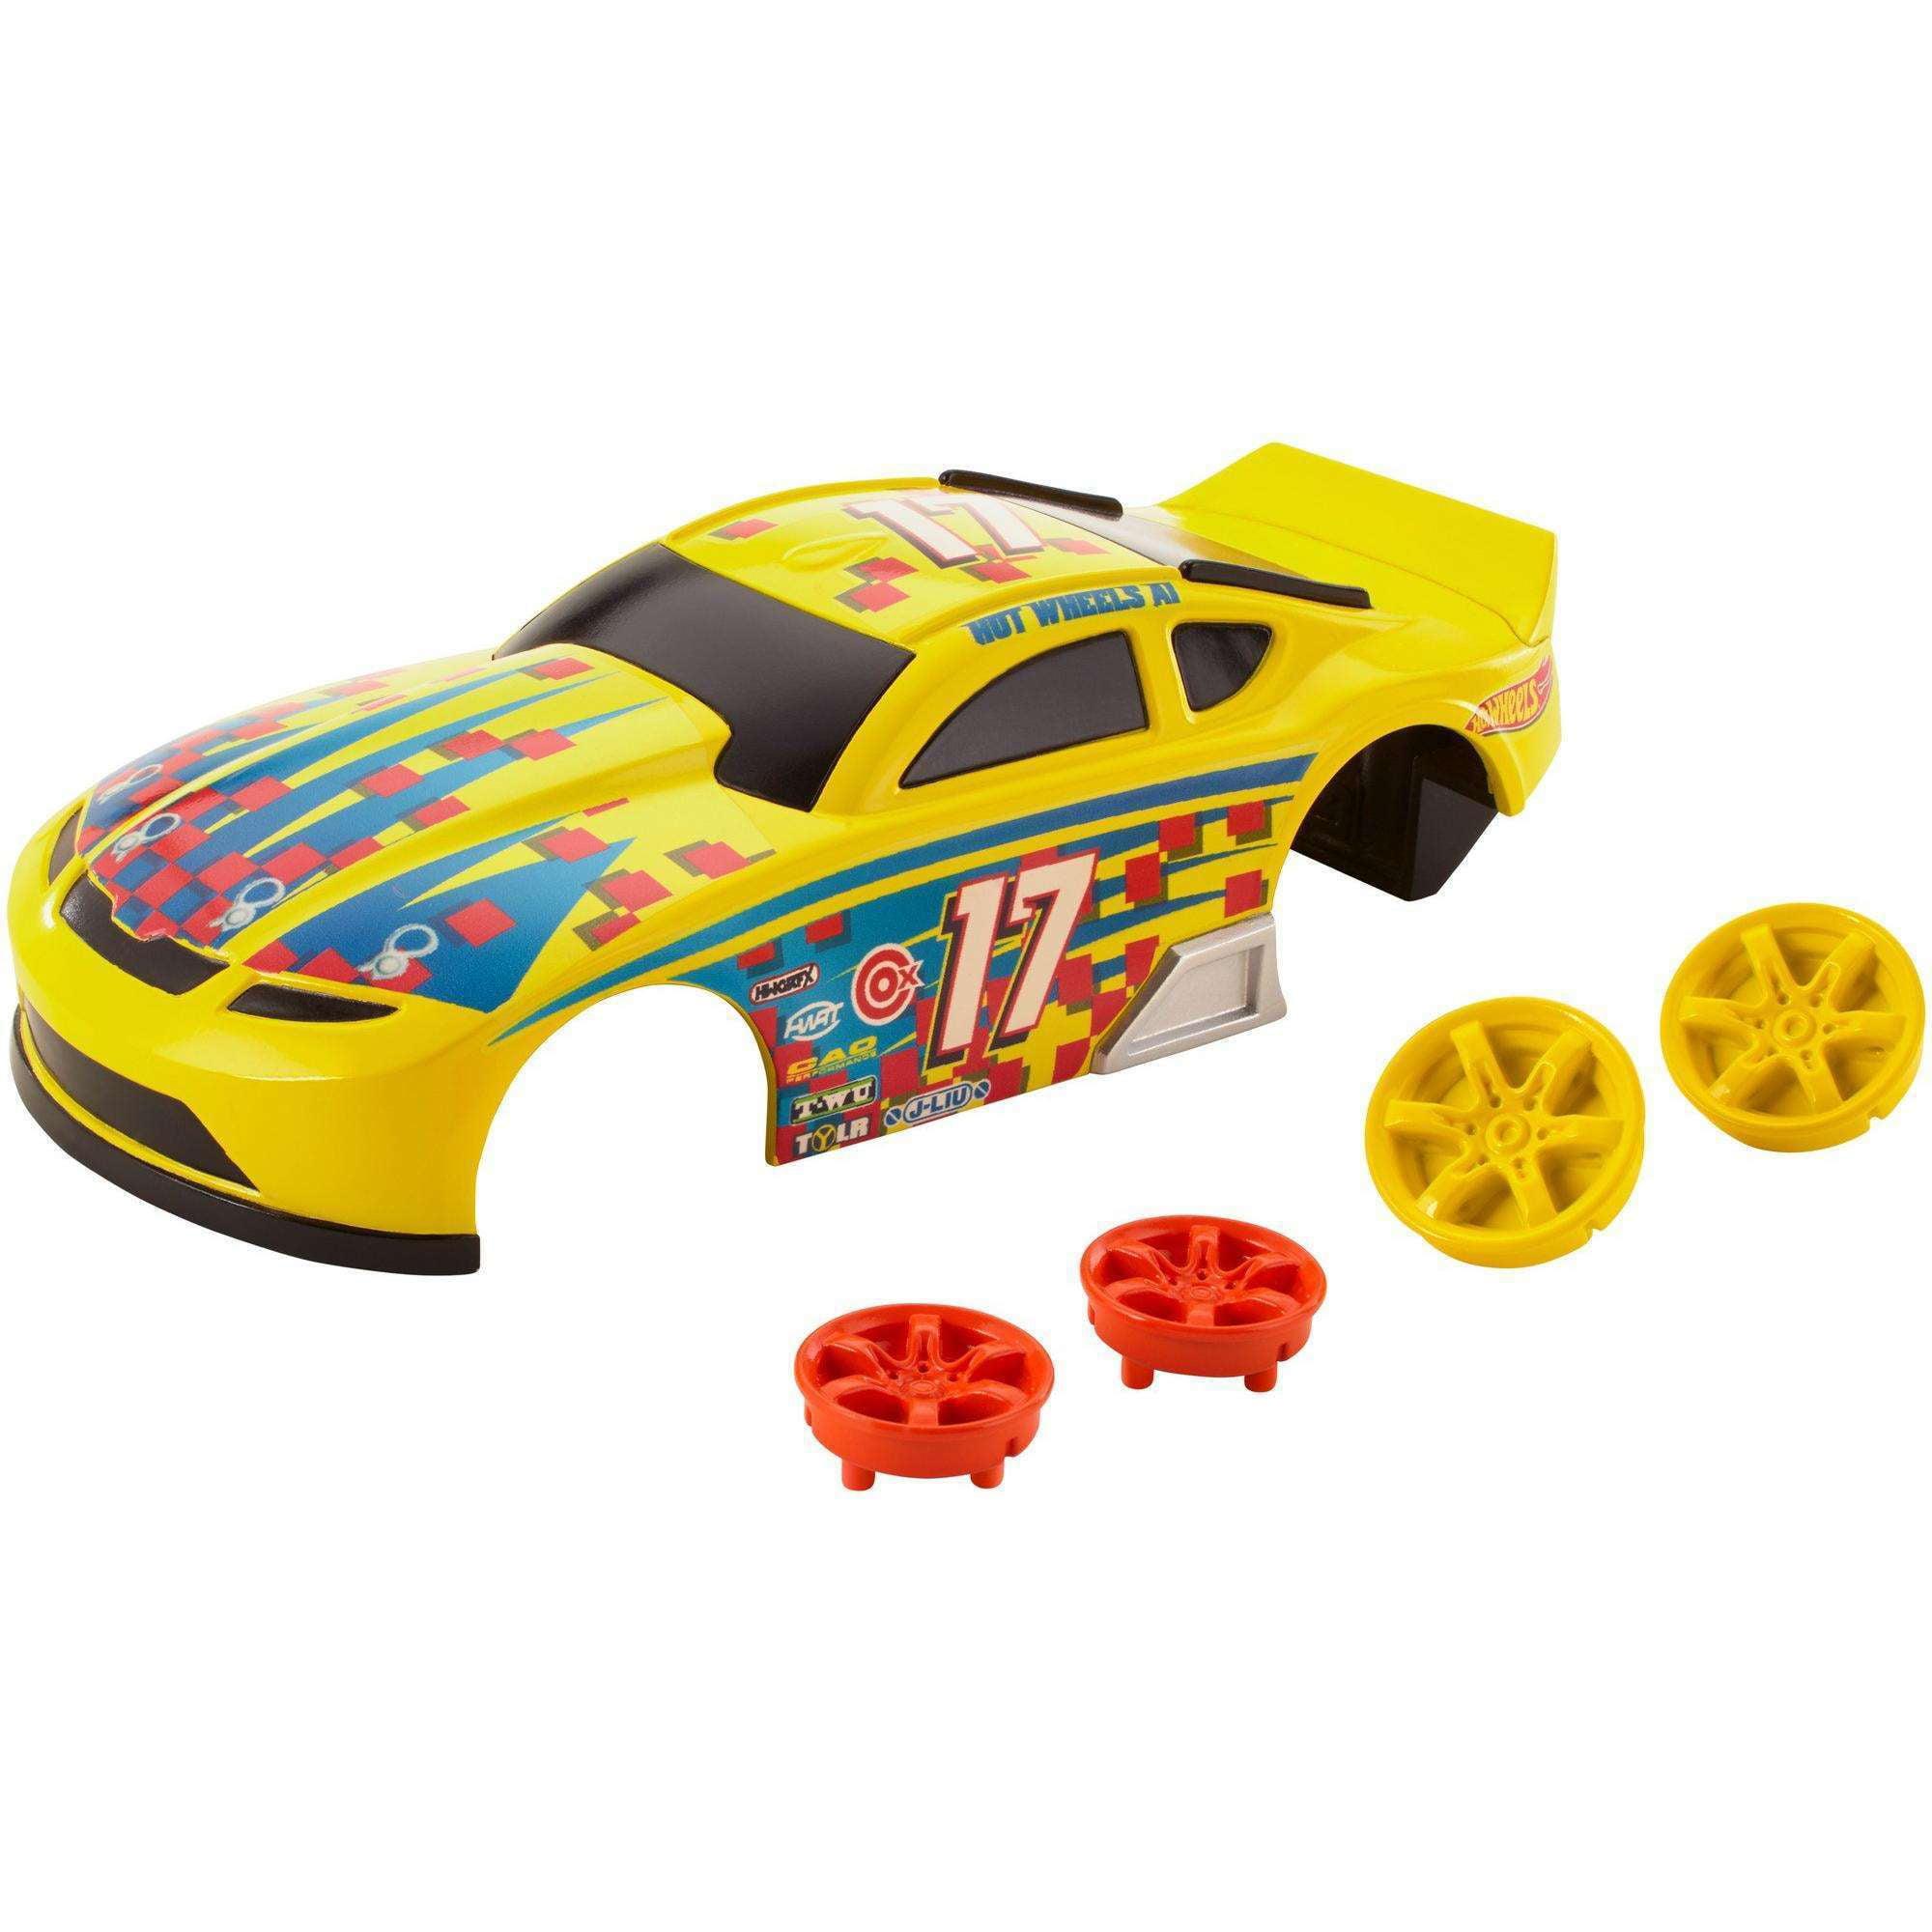 Hot Wheels A.i. Door Slammer Car Body & Wheels Custom Kit by Mattel